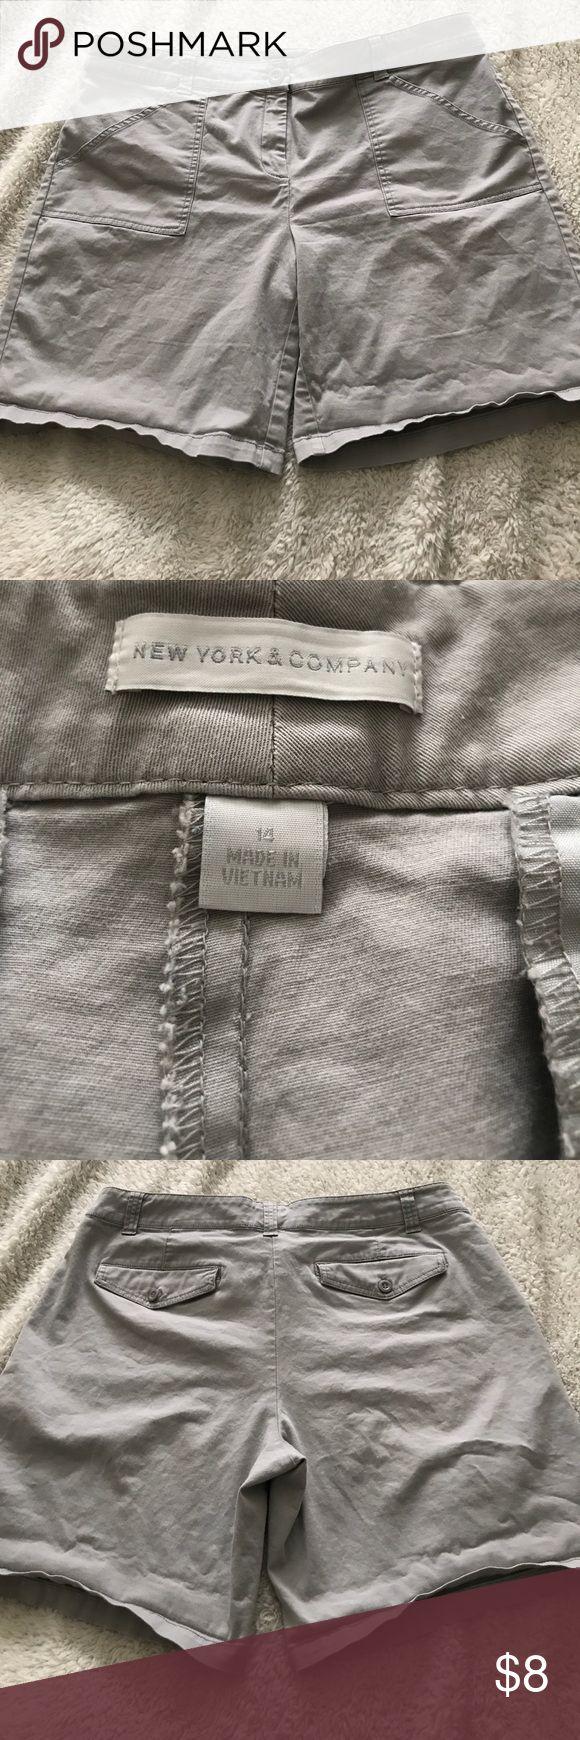 NYC Shorts Women's grey shorts. 7.5 inche inseam and size 14 New York & Company Shorts